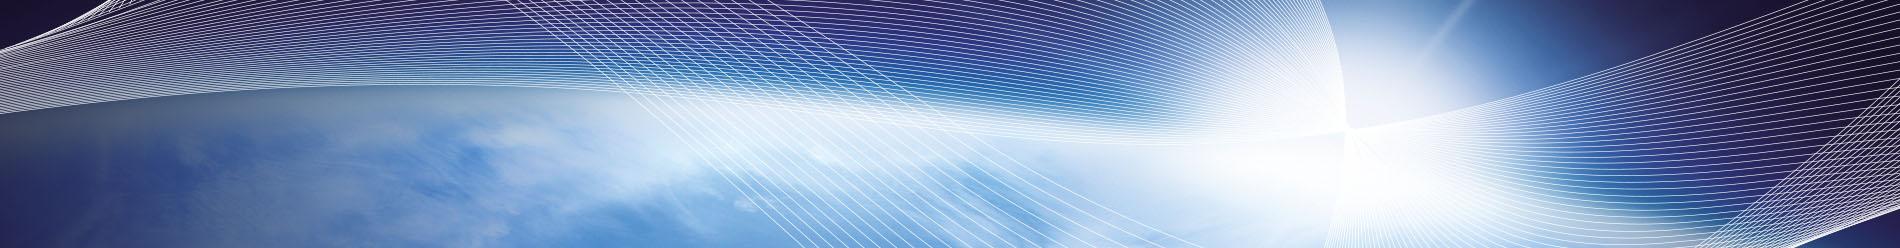 POLARIS Banner 2015.jpg